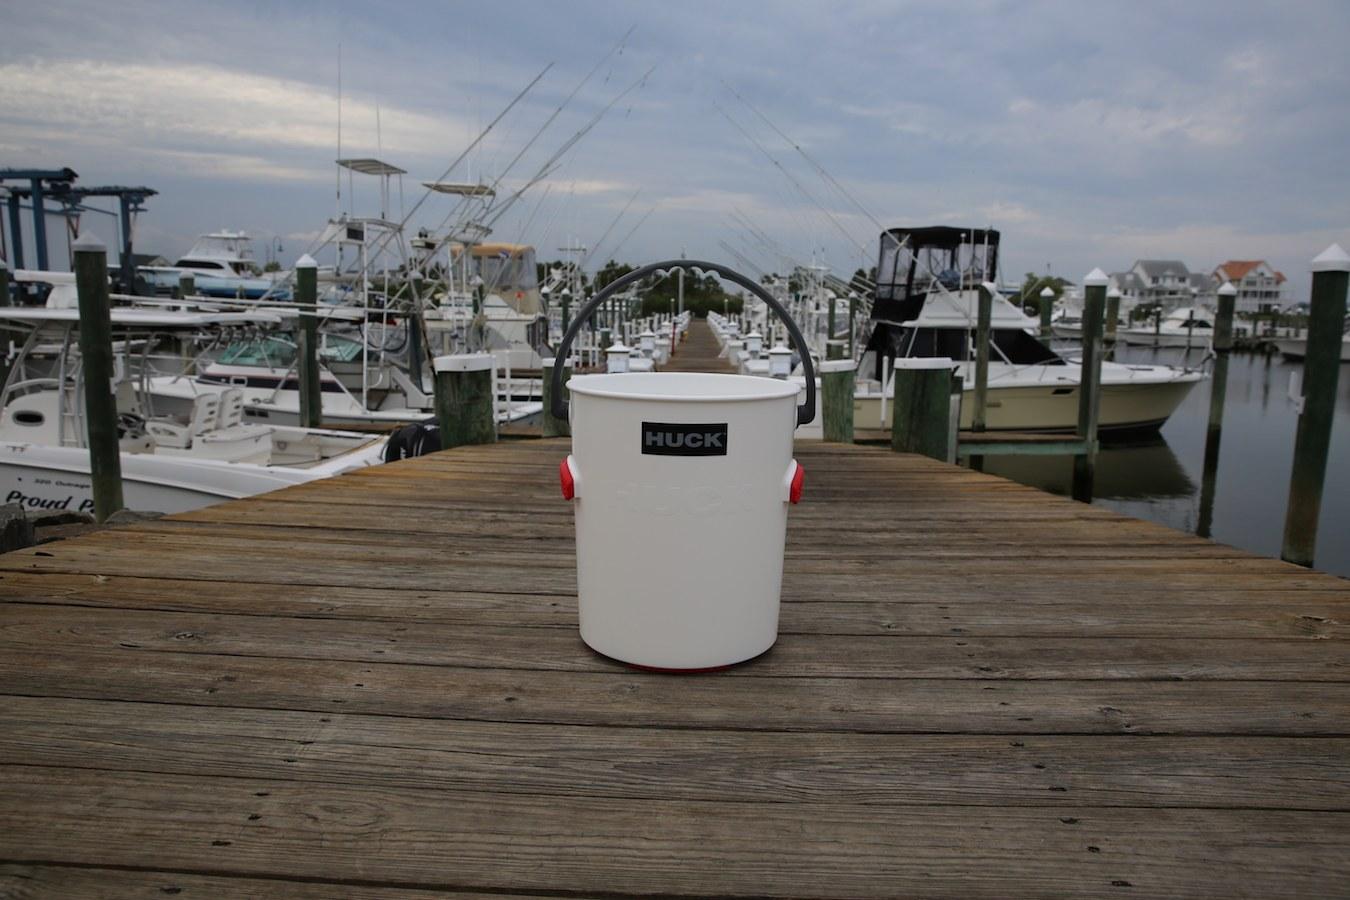 Huck Bucket - On Dock